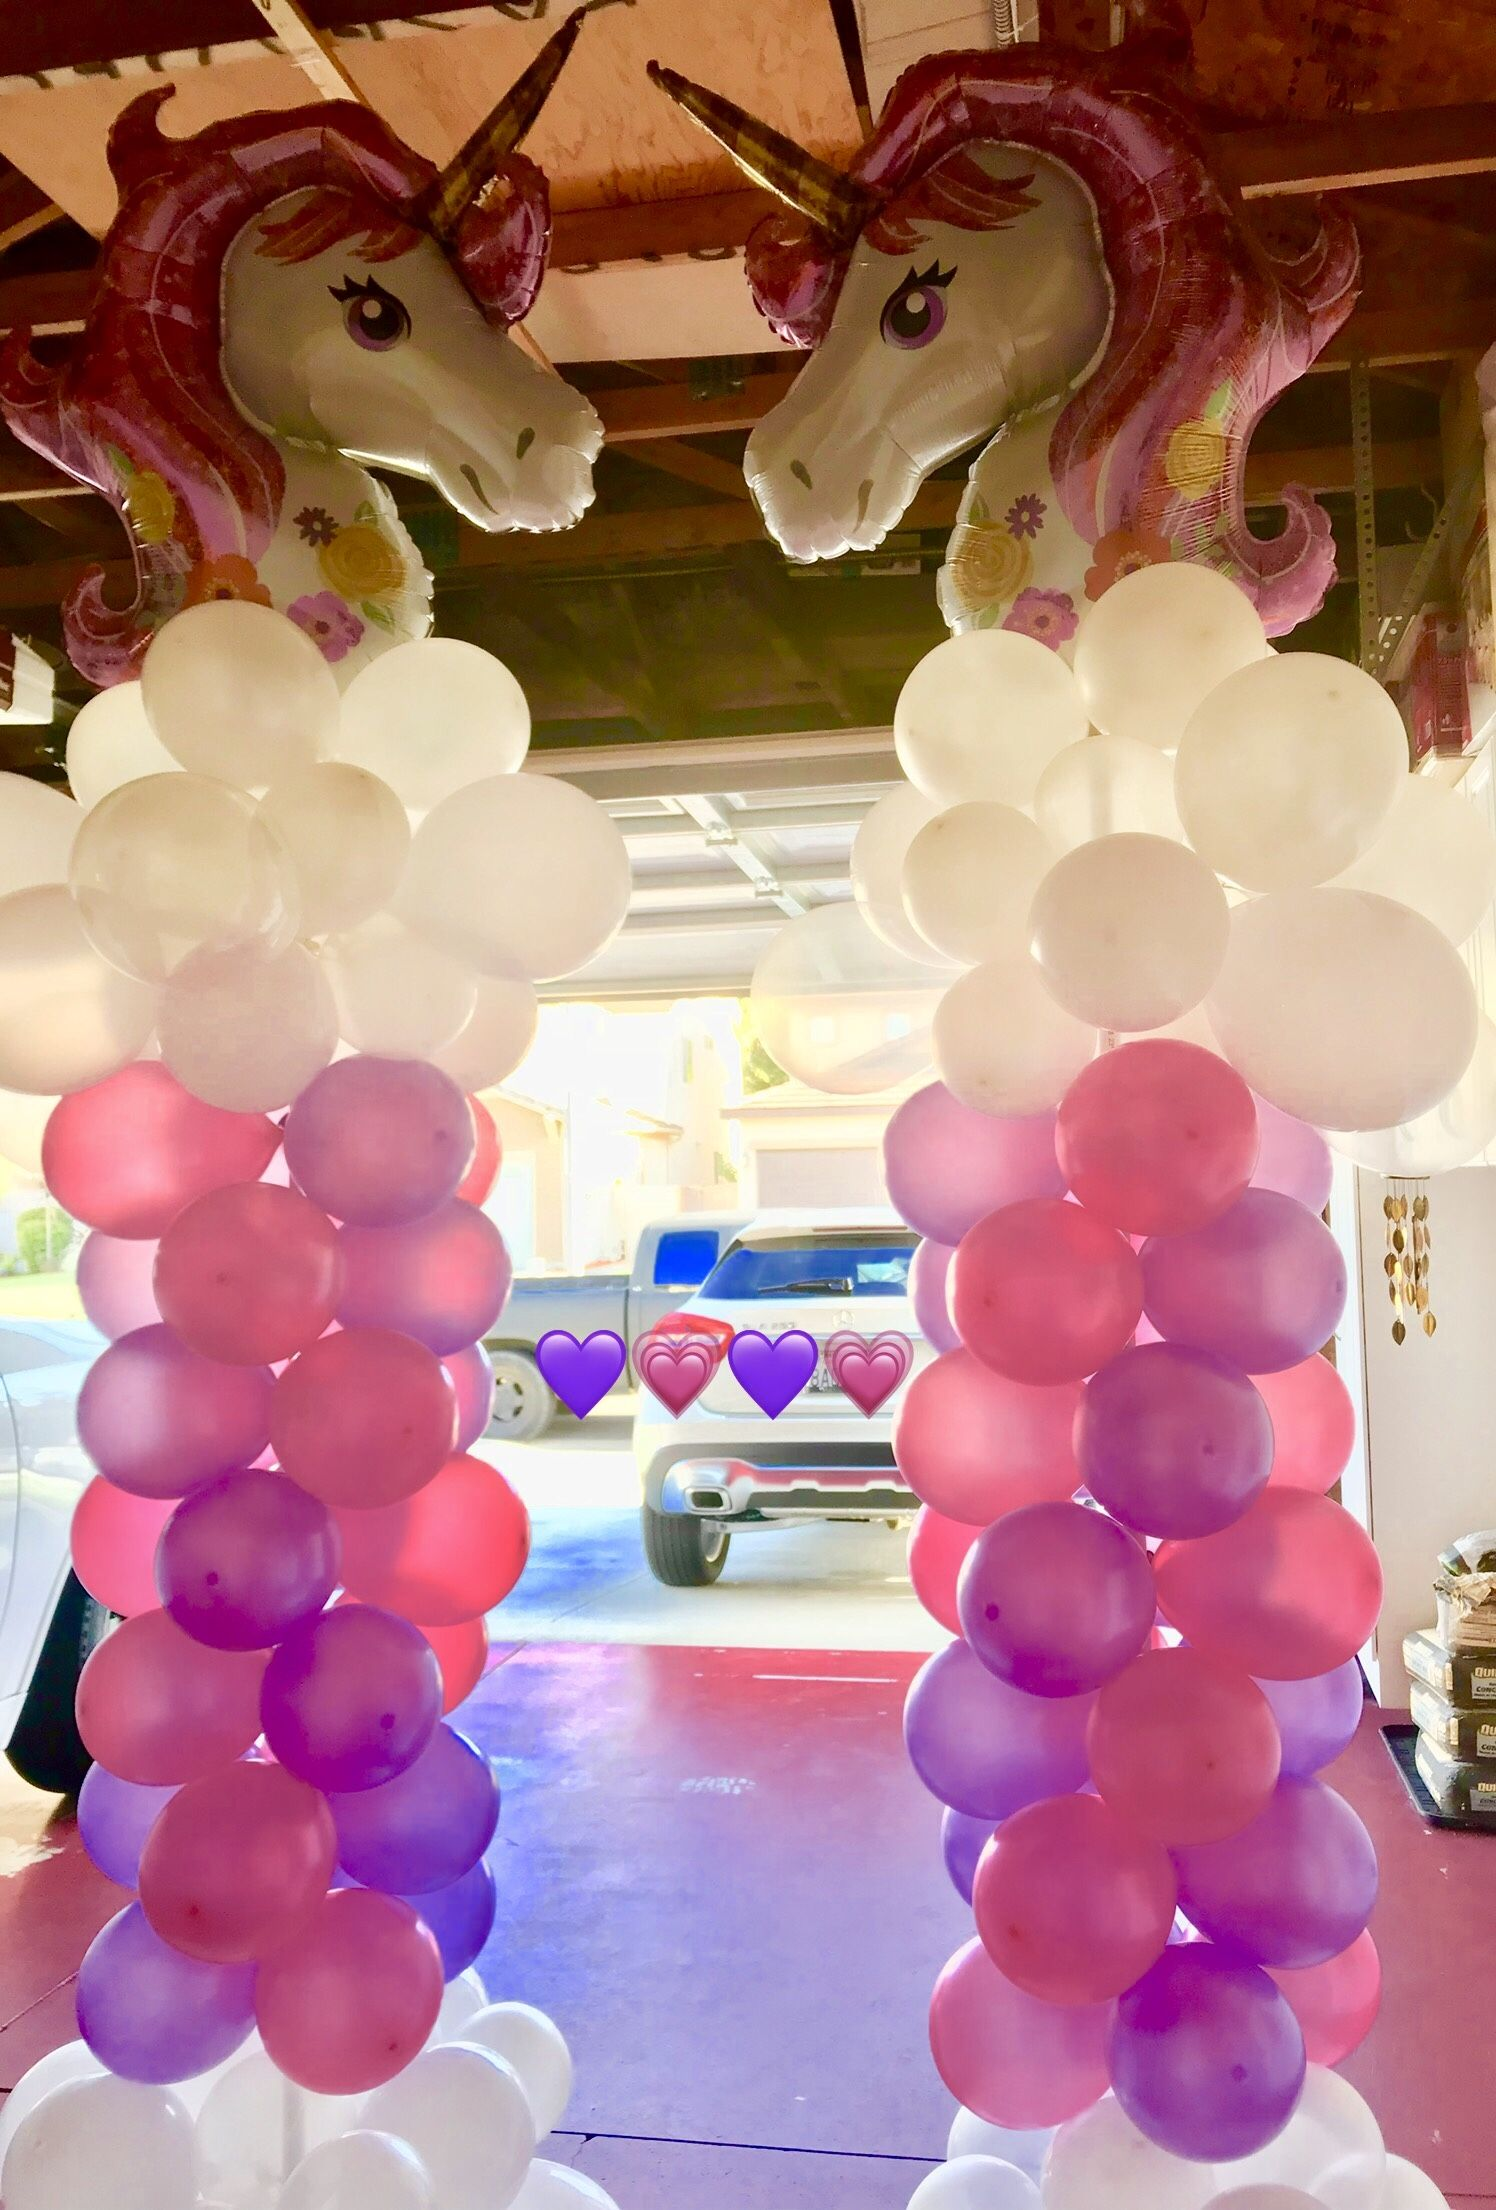 Magical Unicorn Balloon Pillars Unicorn Party Ideas Unicorn Balloon Columns Balloon Decorations Event Decor Balloons